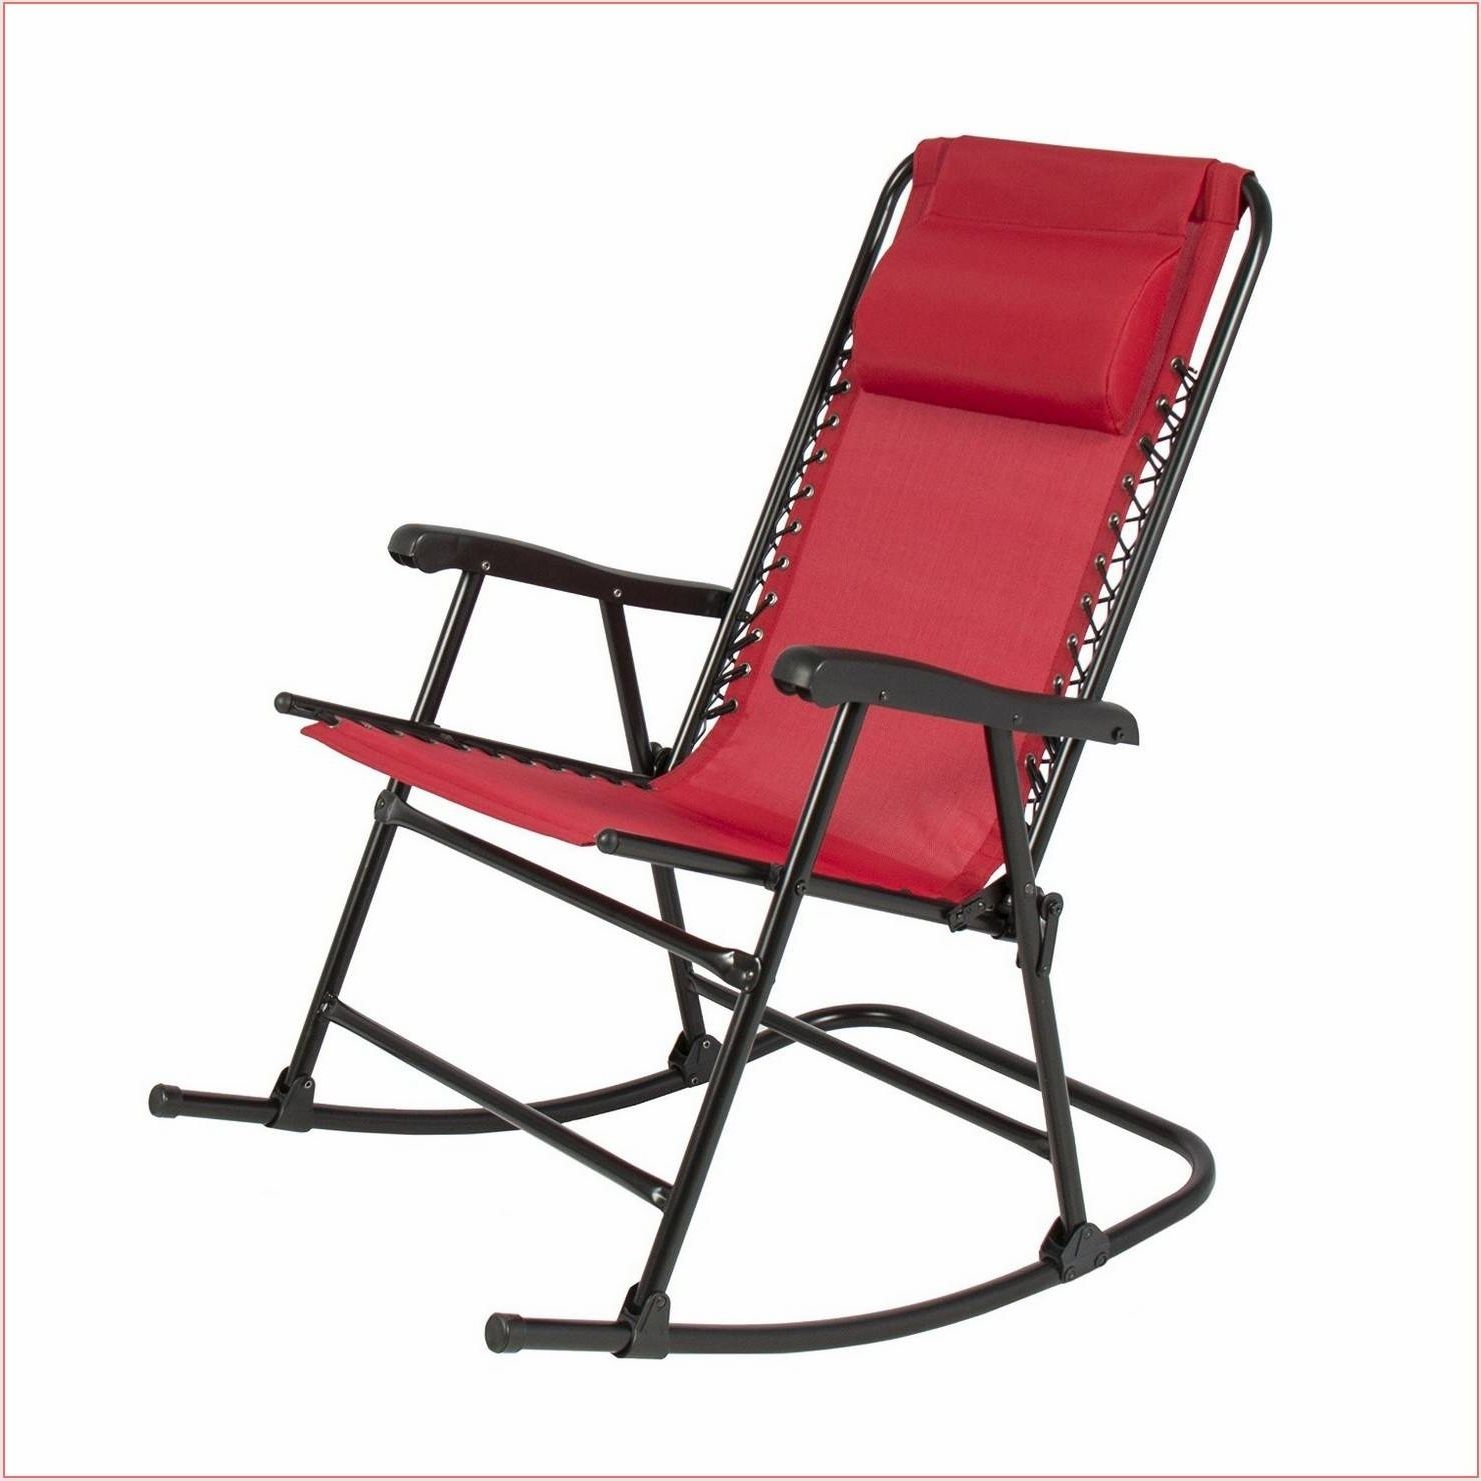 Plus Size Folding Lawn Chairs. Plus Size Folding Lawn Chairs   Folding Chairs   Pinterest   Lawn